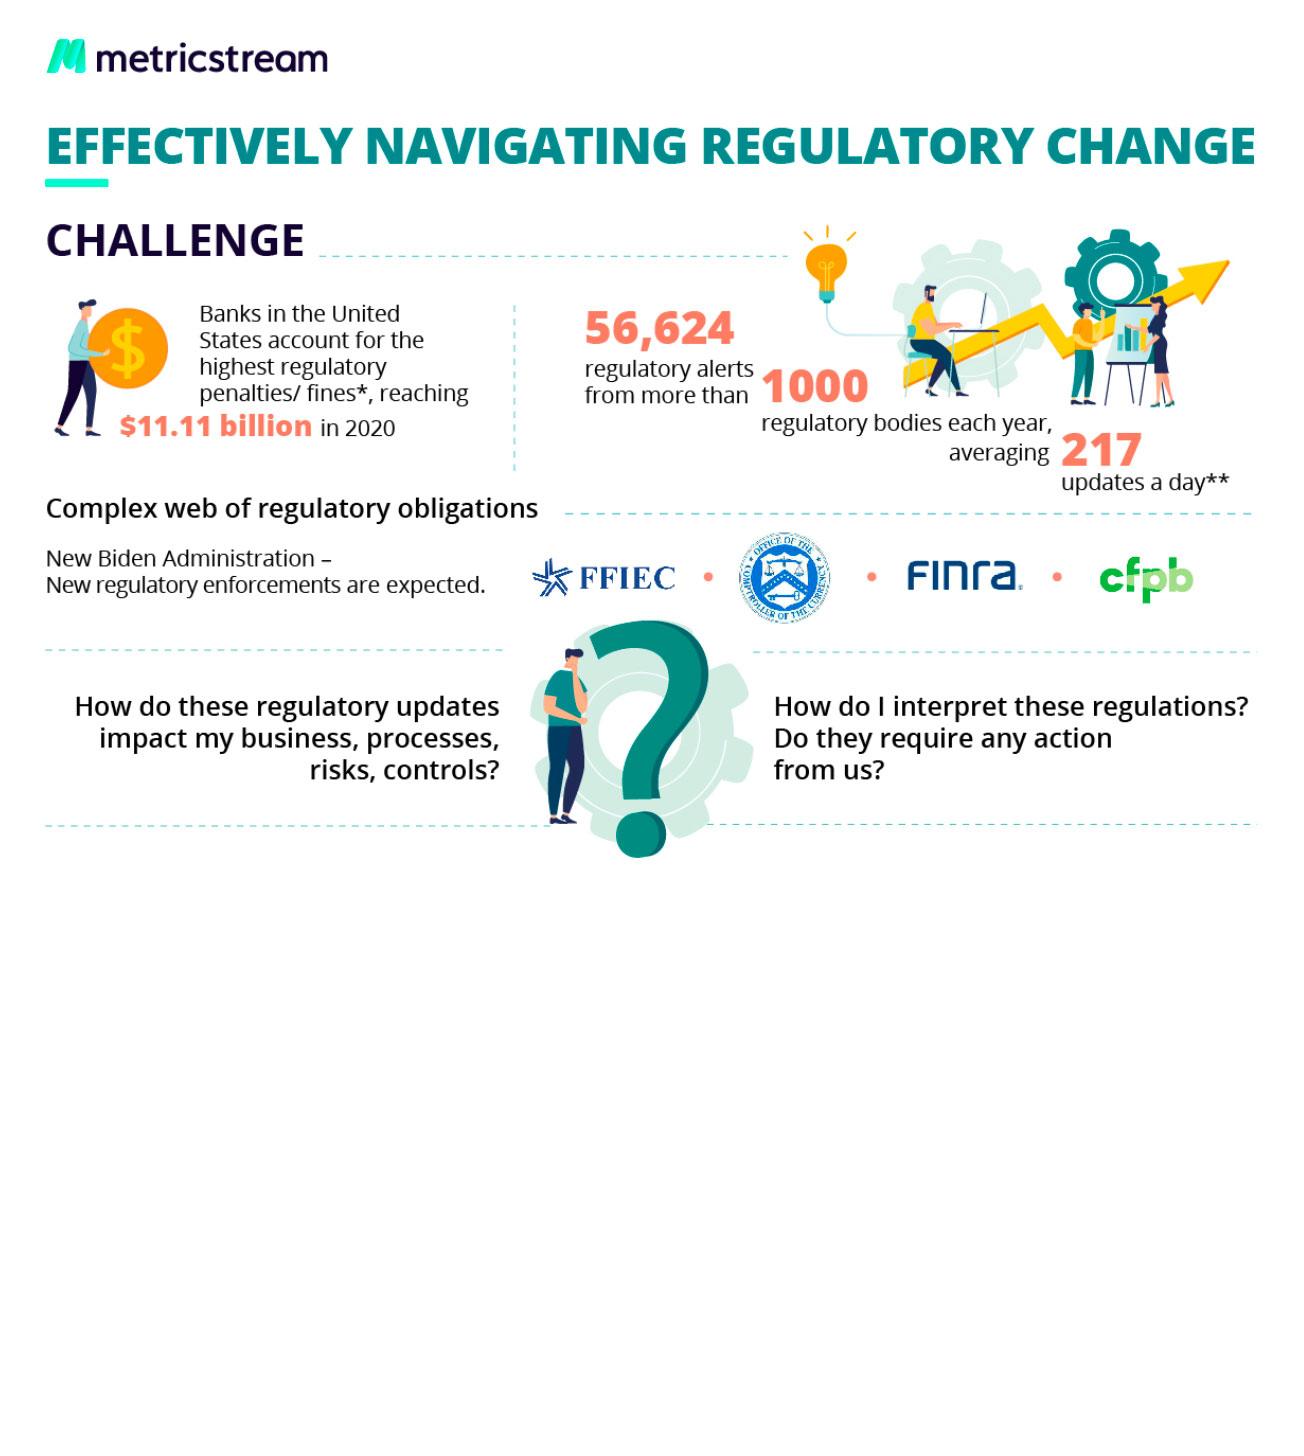 effective-navigating-regulatory-change-hubspot